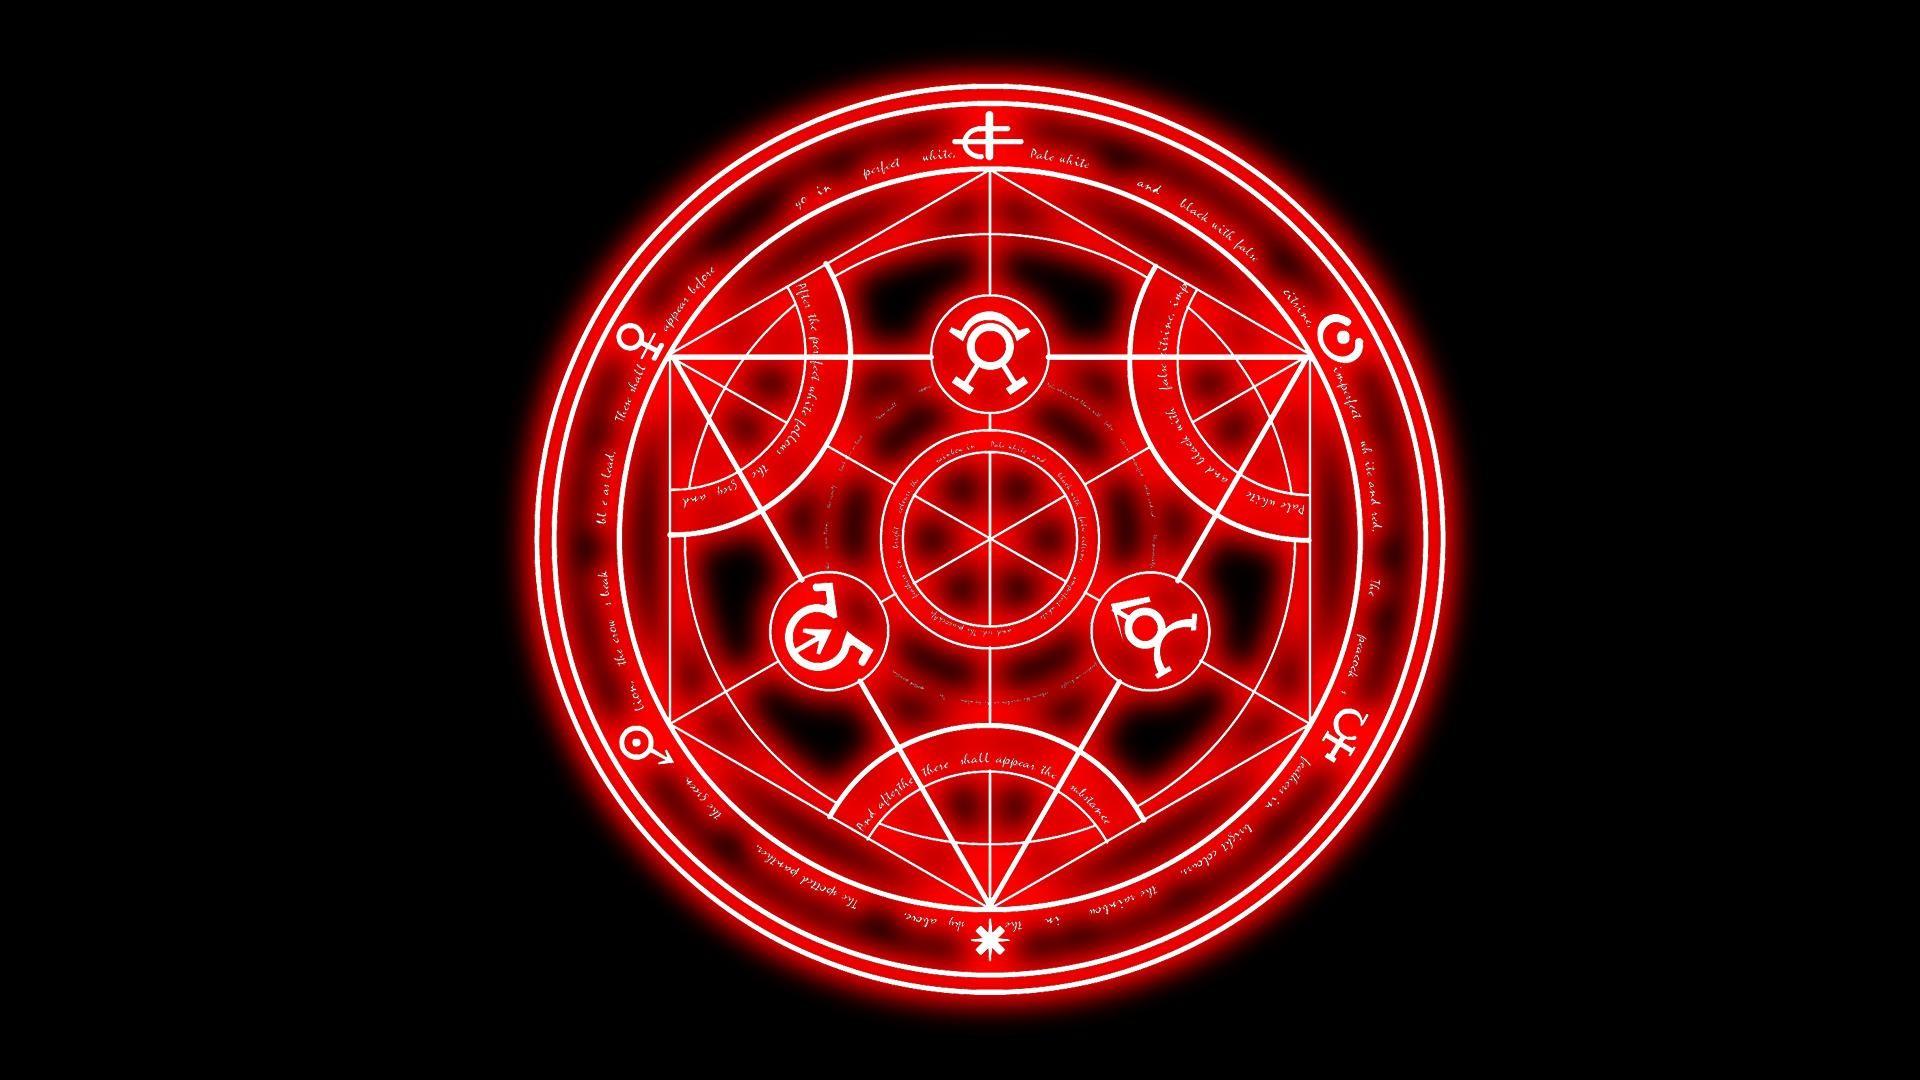 fullmetal alchemist wallpaper ·① download free stunning high